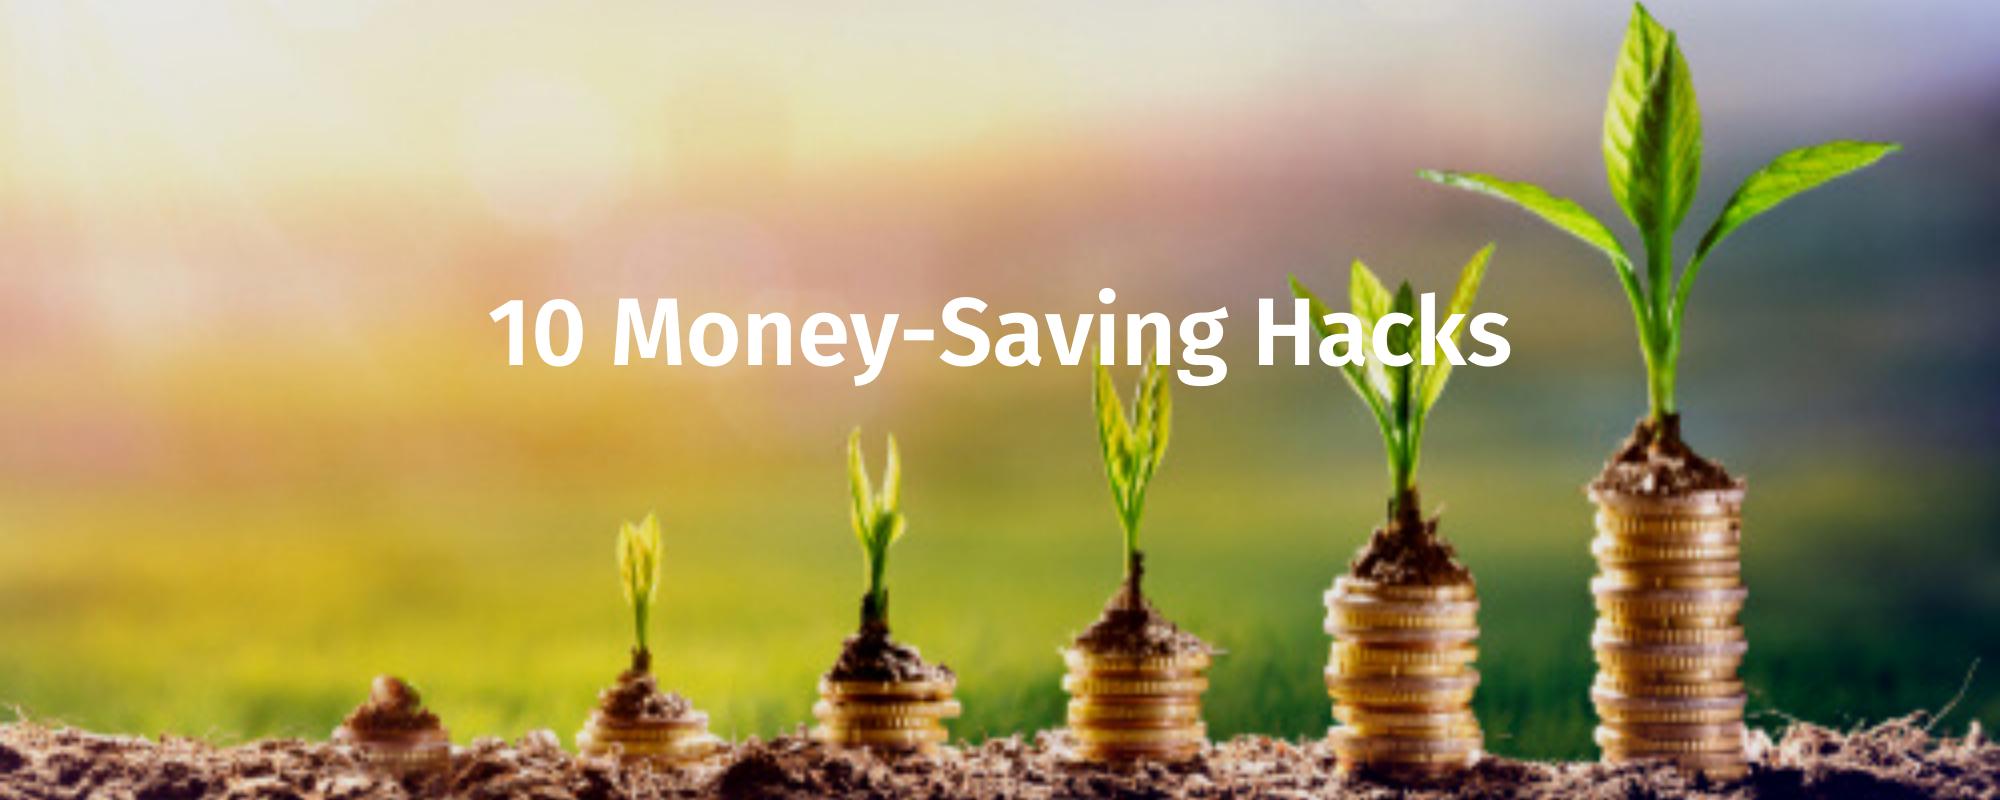 10 Money-Saving Hacks